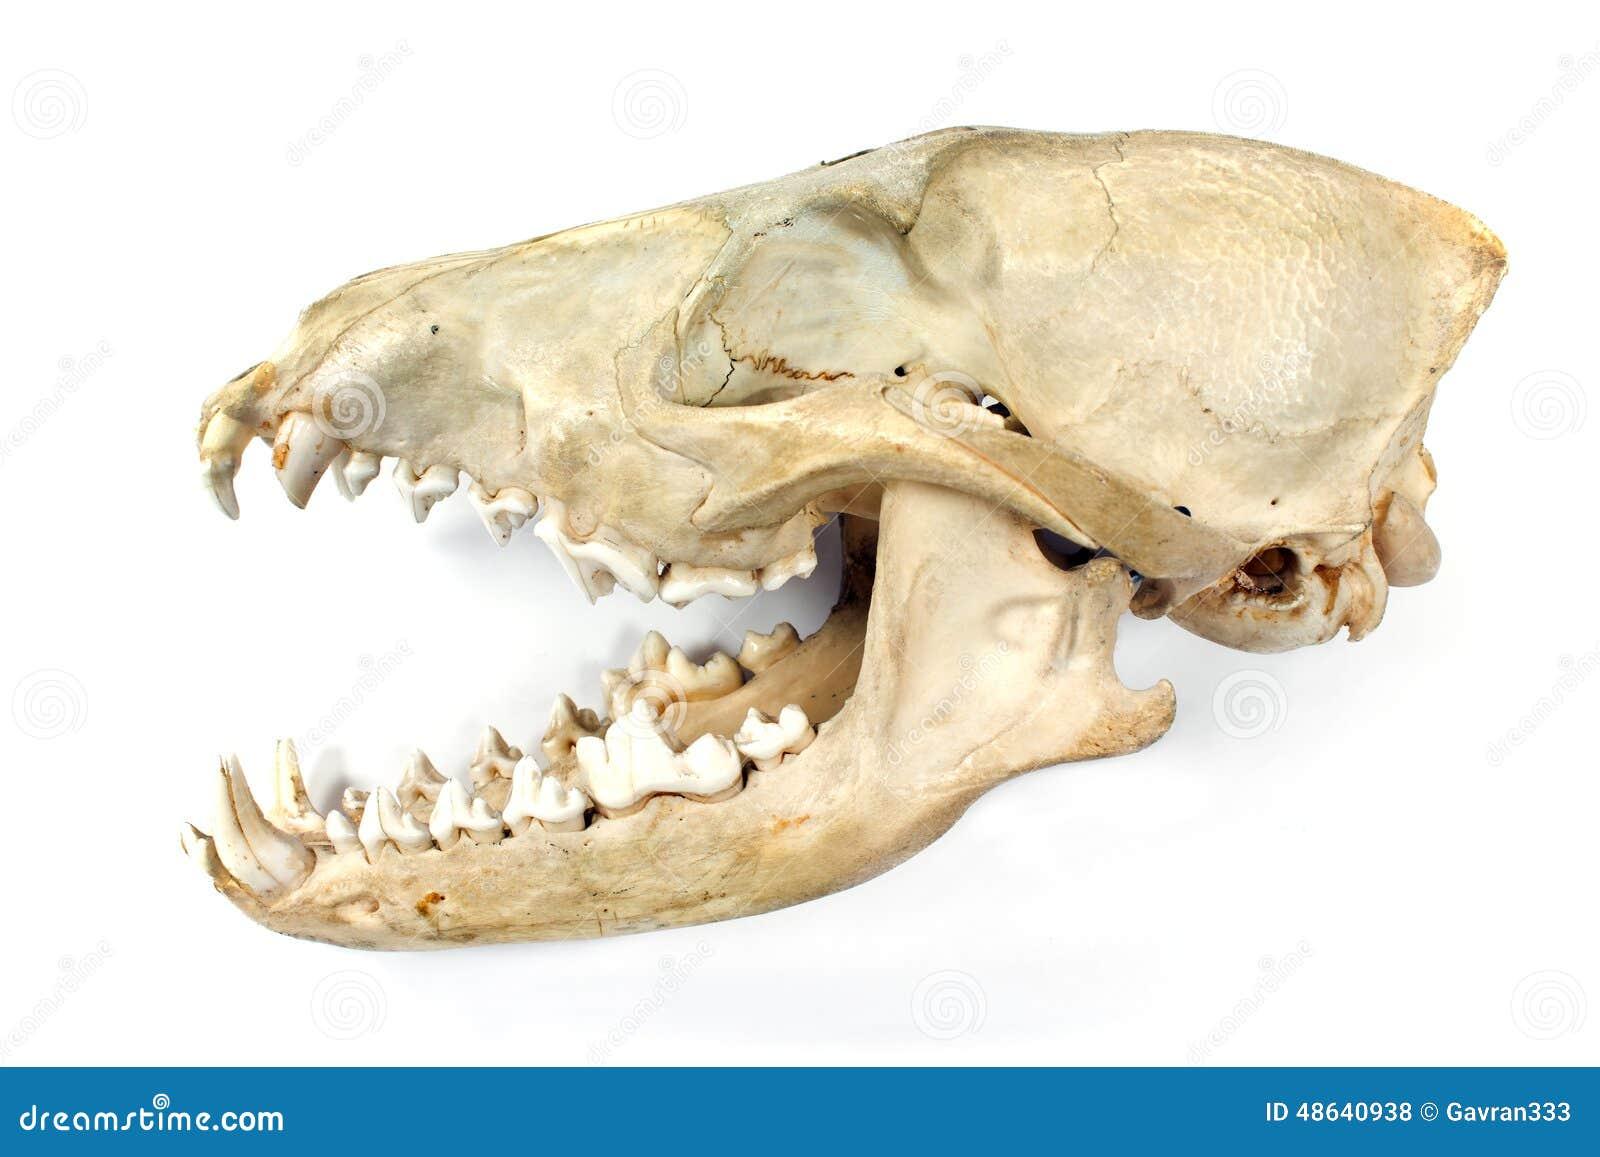 Canine jaw anatomy 766225 - follow4more.info